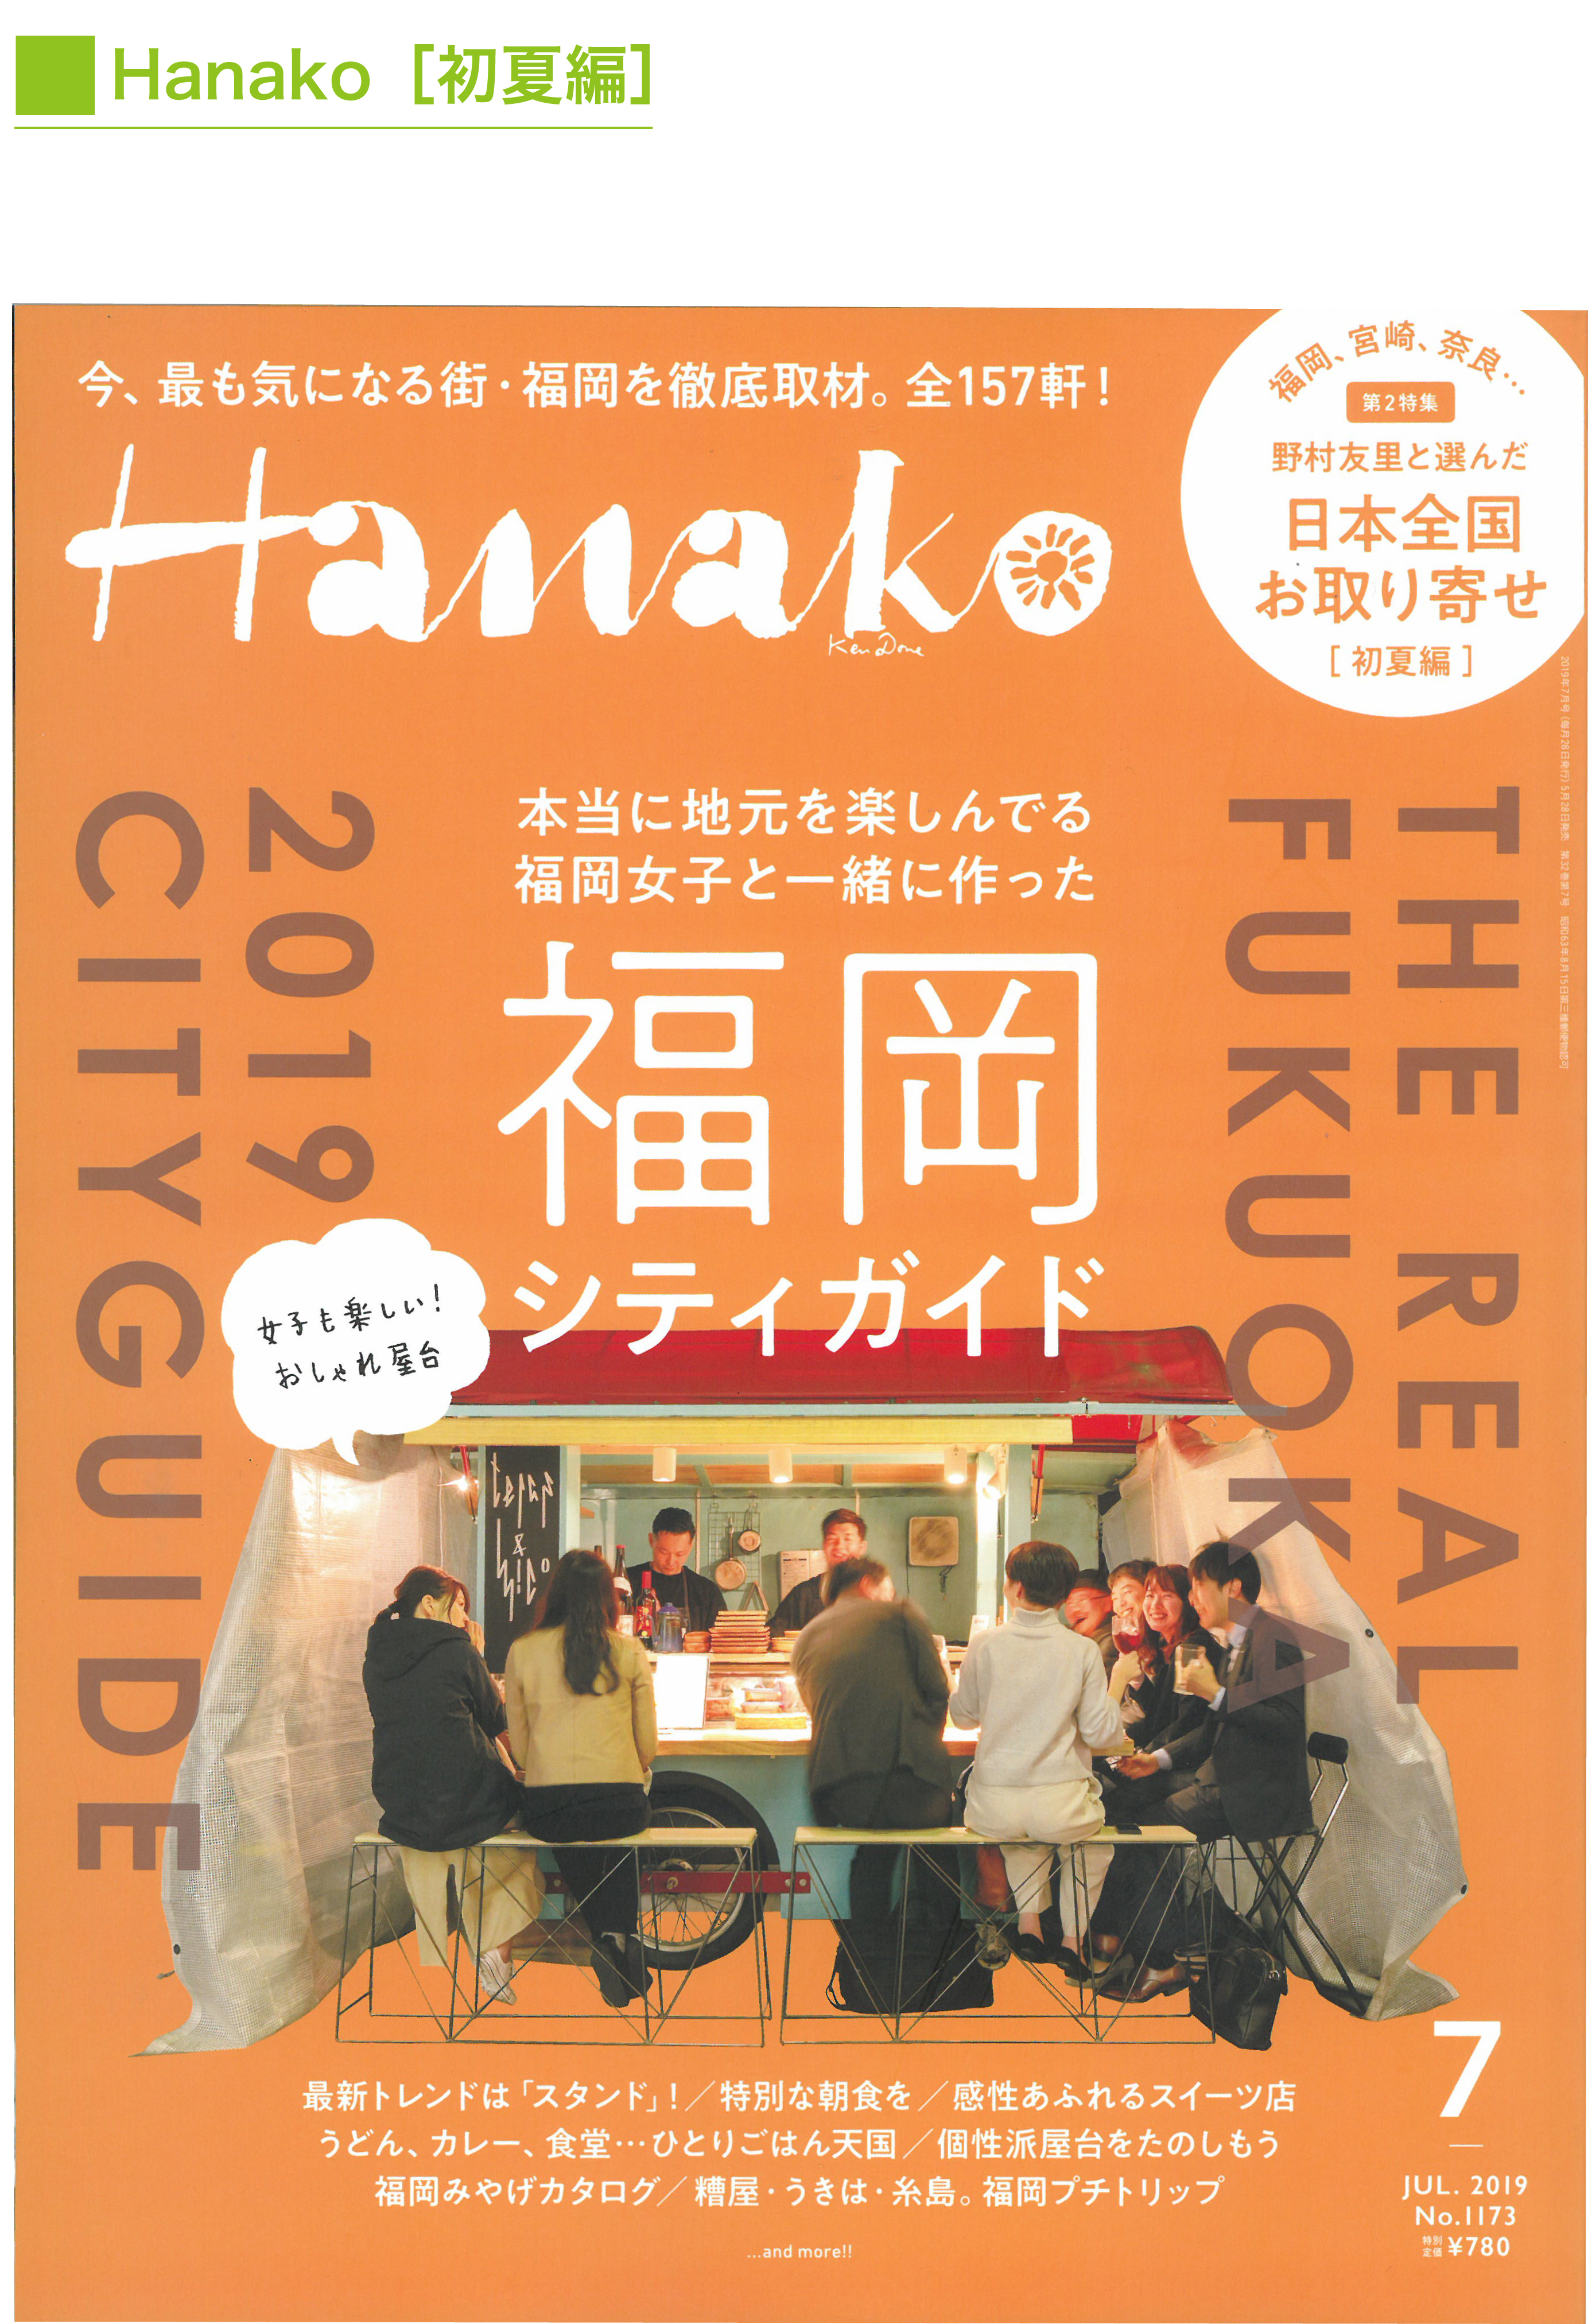 Hanako福岡シティガイド